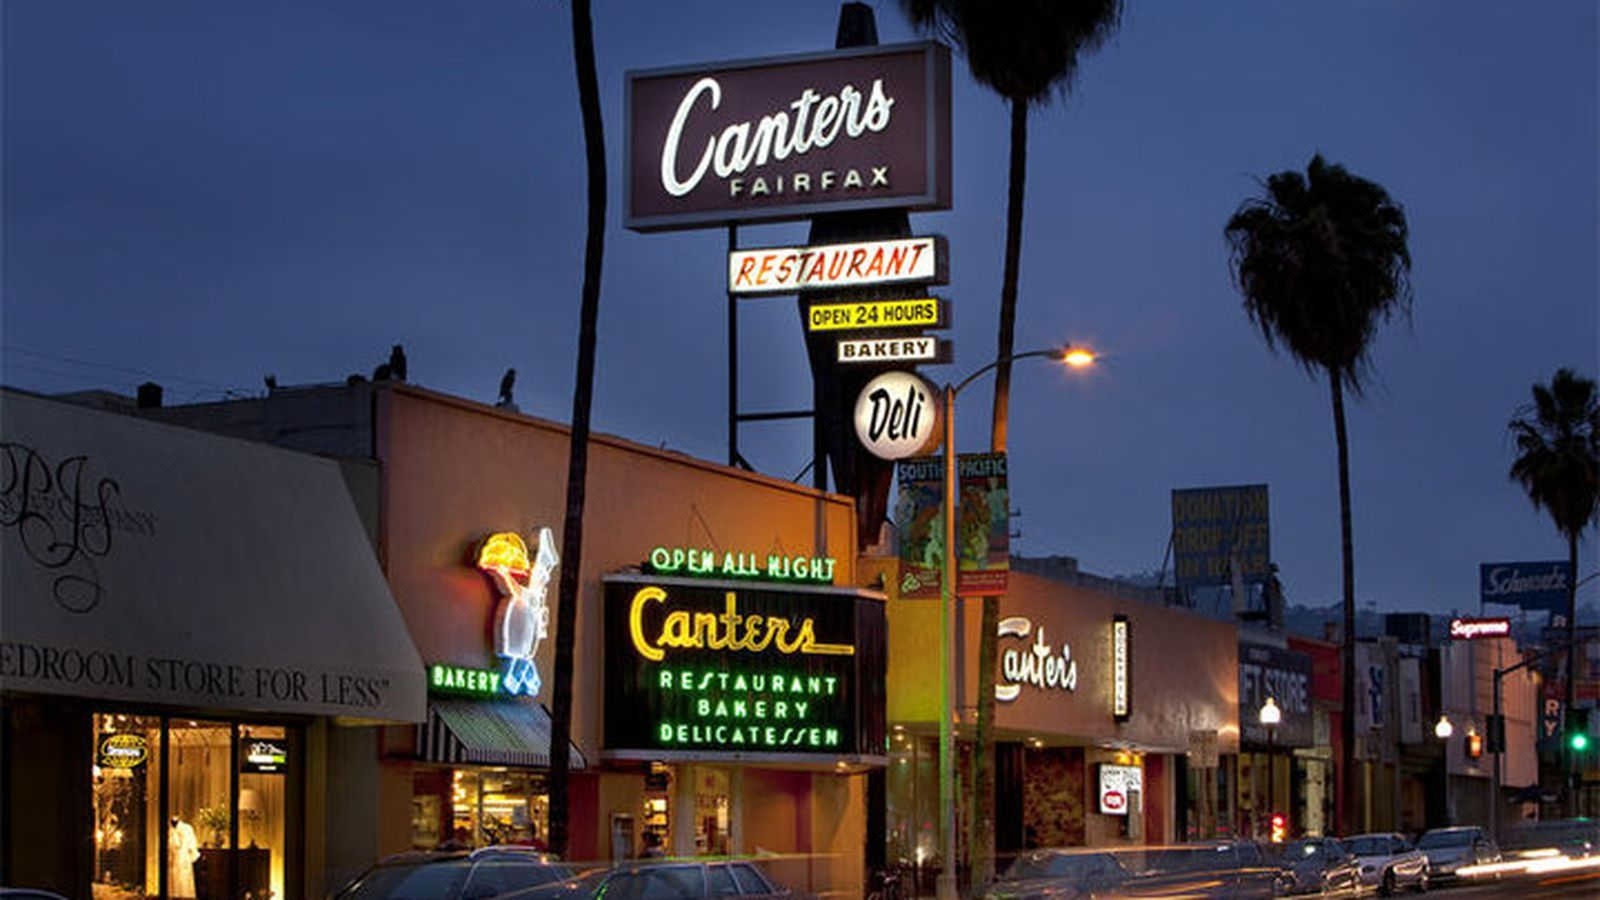 La S 19 Best Late Night Dining Restaurants Hollywood Restaurants Canter Los Angeles Restaurants